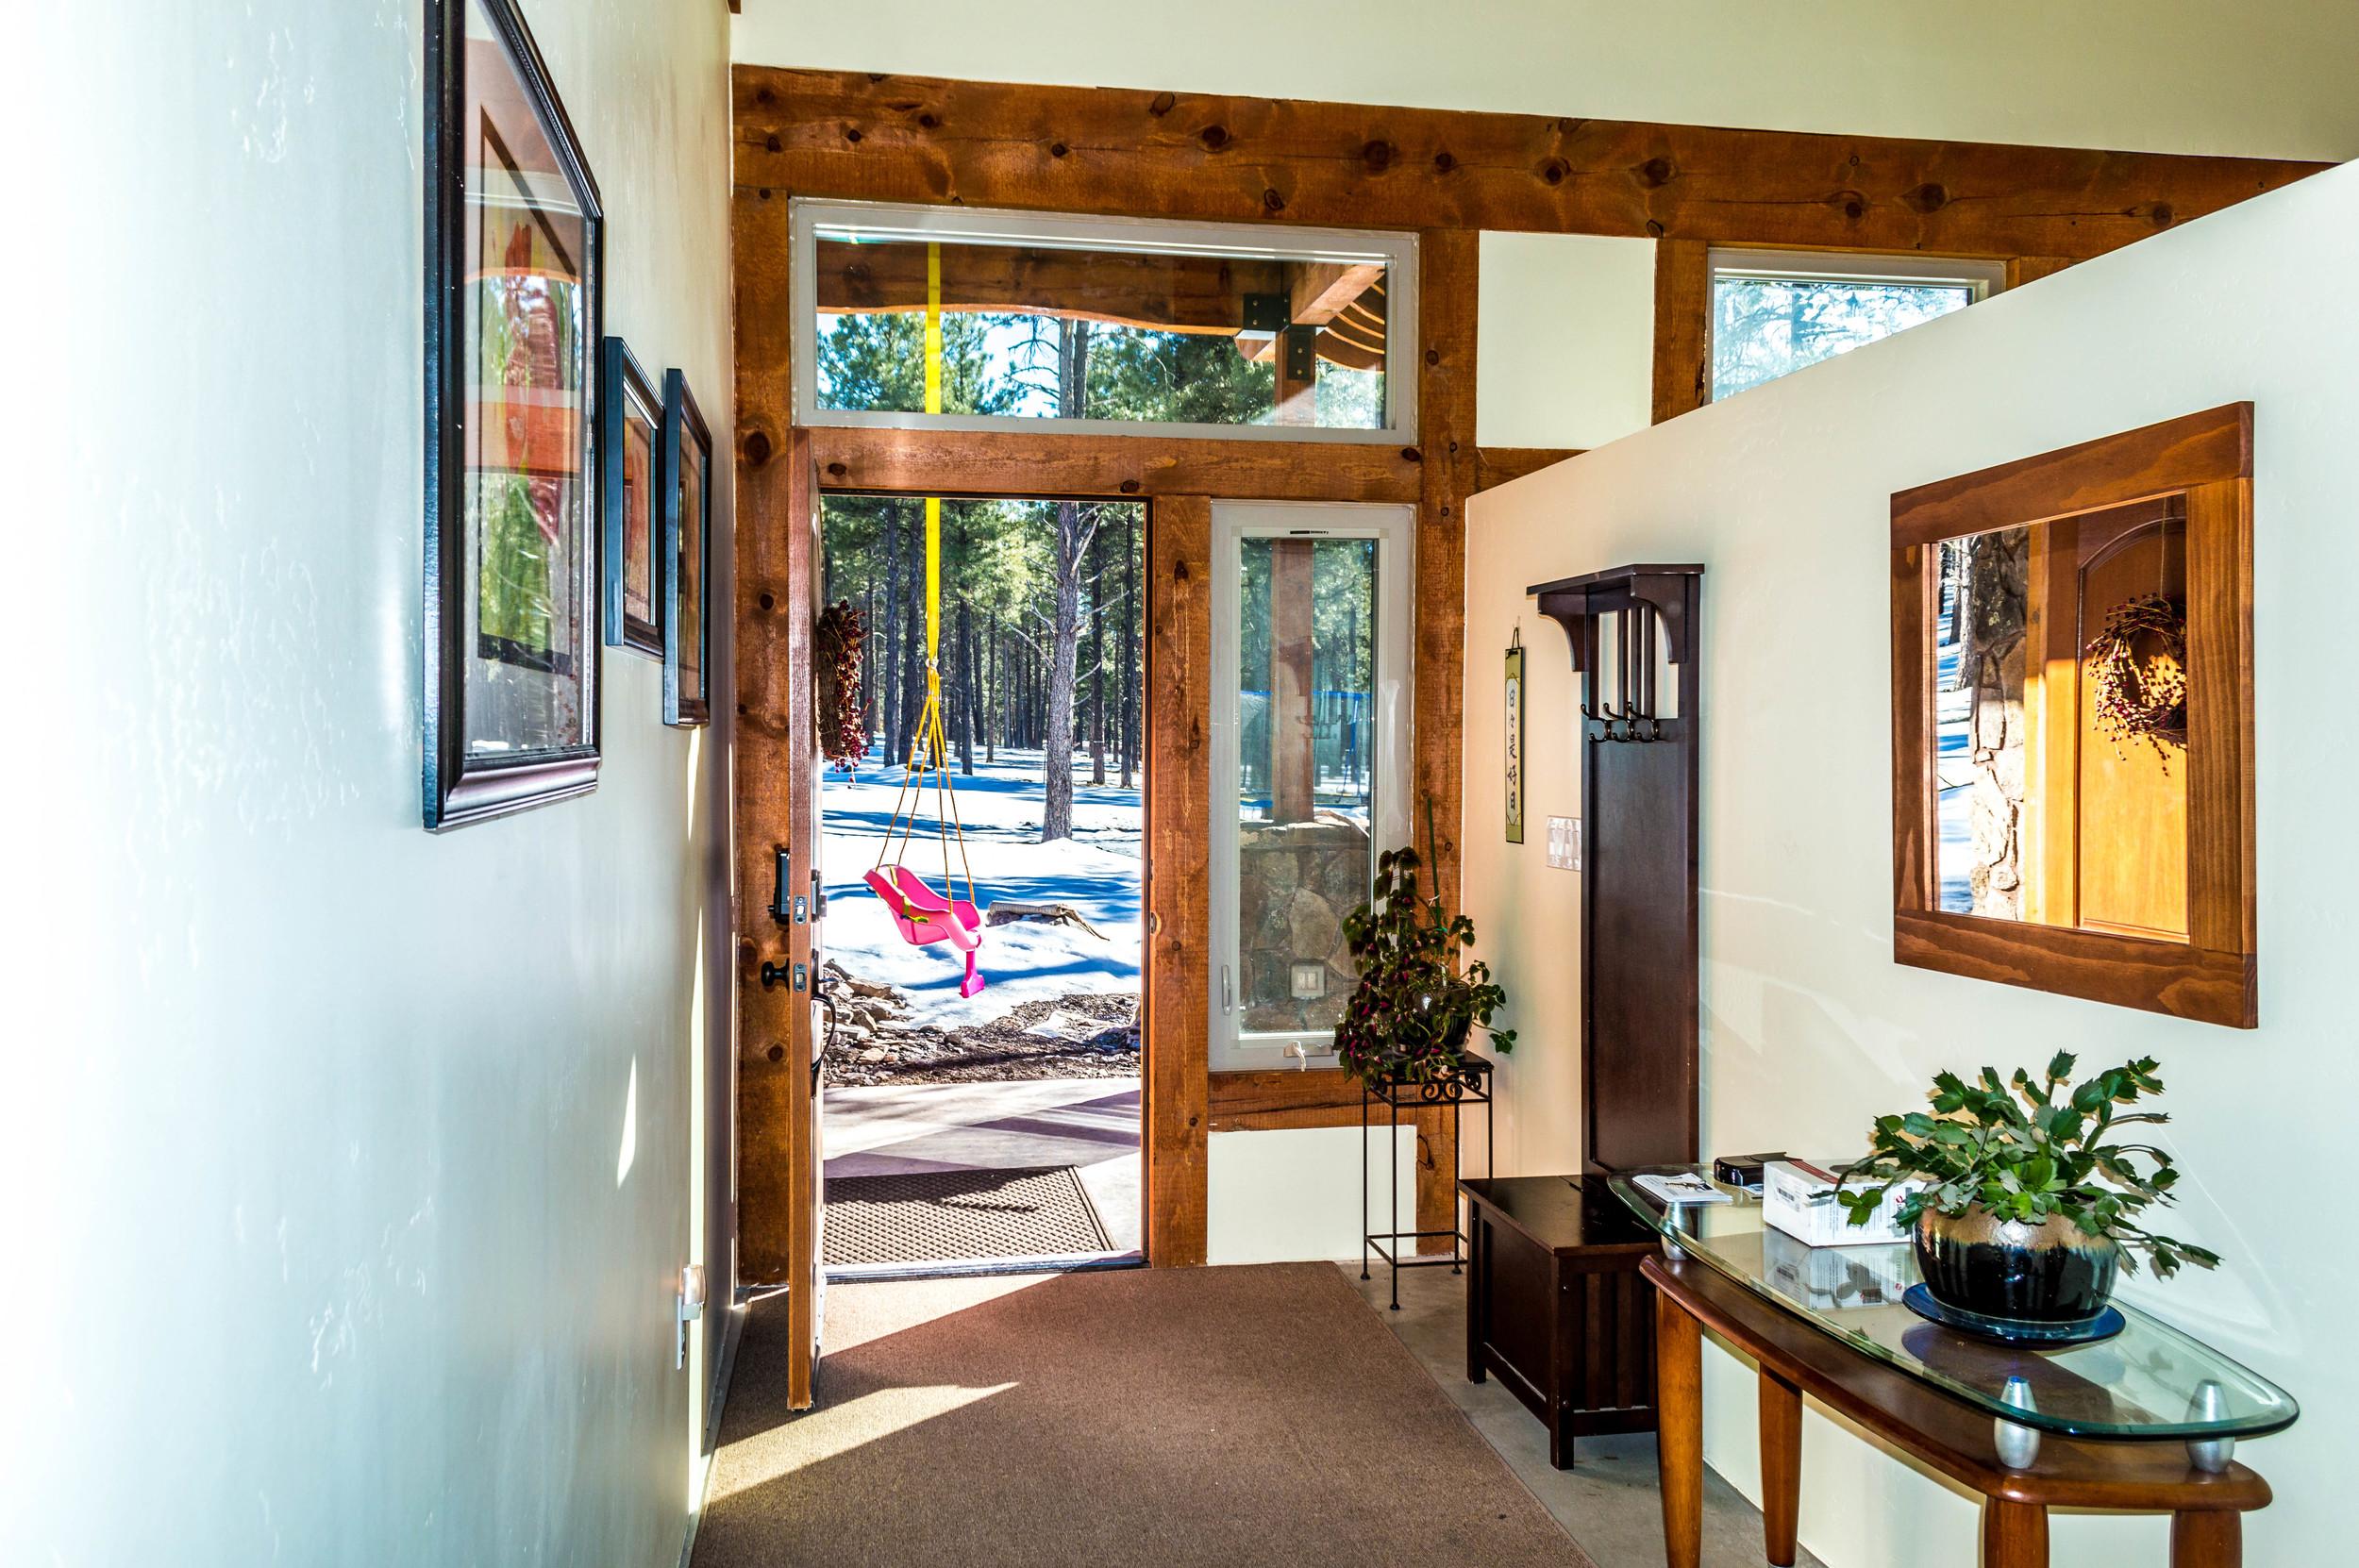 Patio entrance in a residential home near Flagstaff, Arizona.